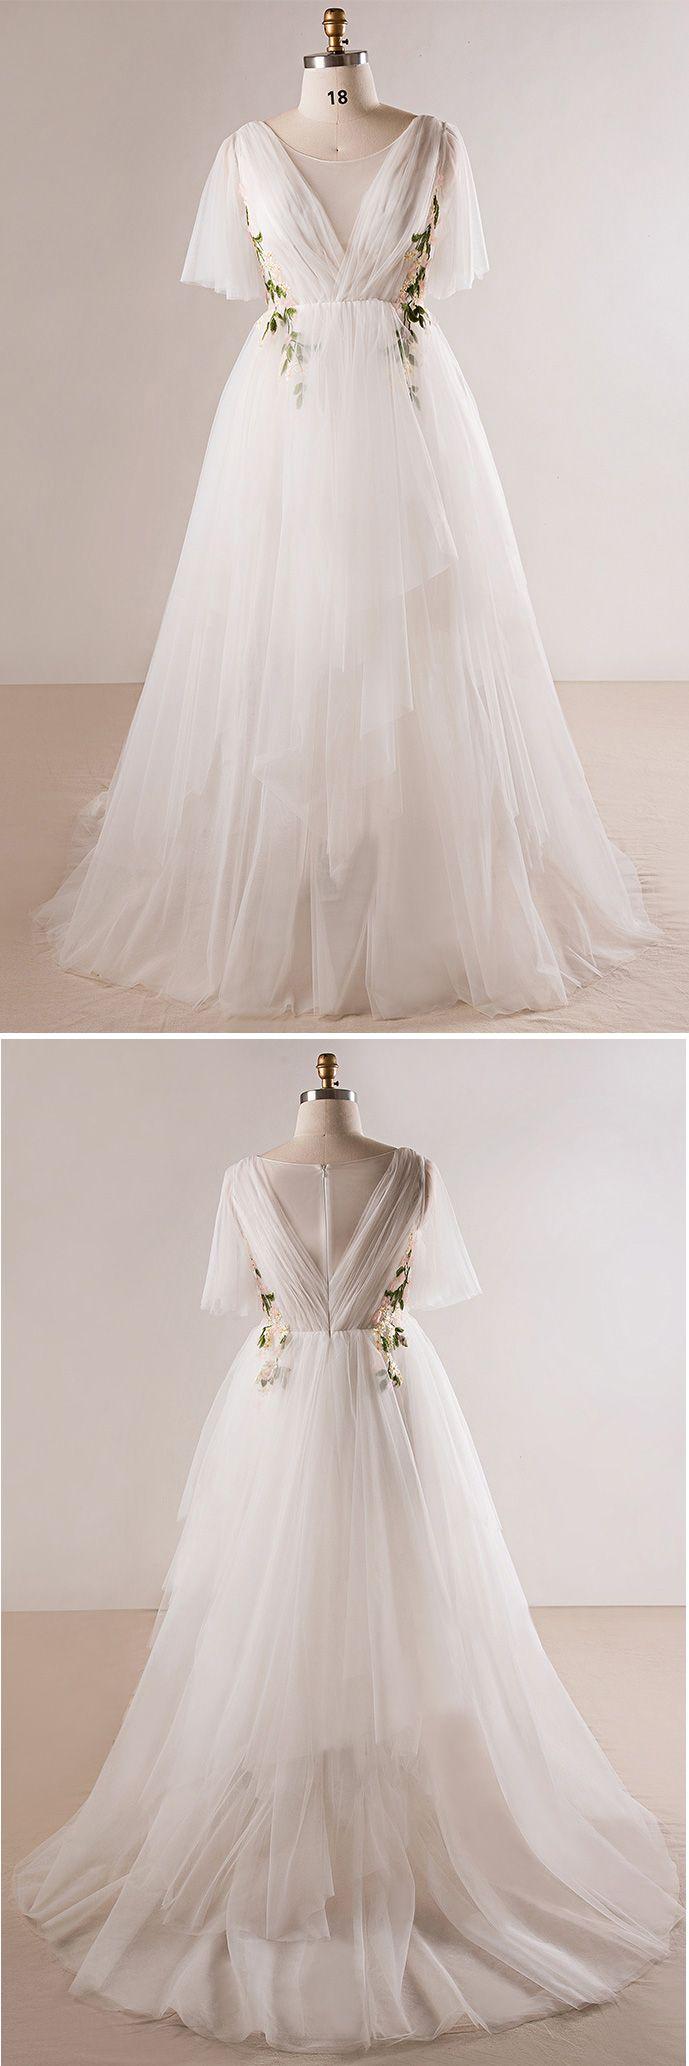 Plus Size Flowing Long Tulle Flowers Beach Wedding Dress For Outdoor Weddings #MN026 – GemGrace.com